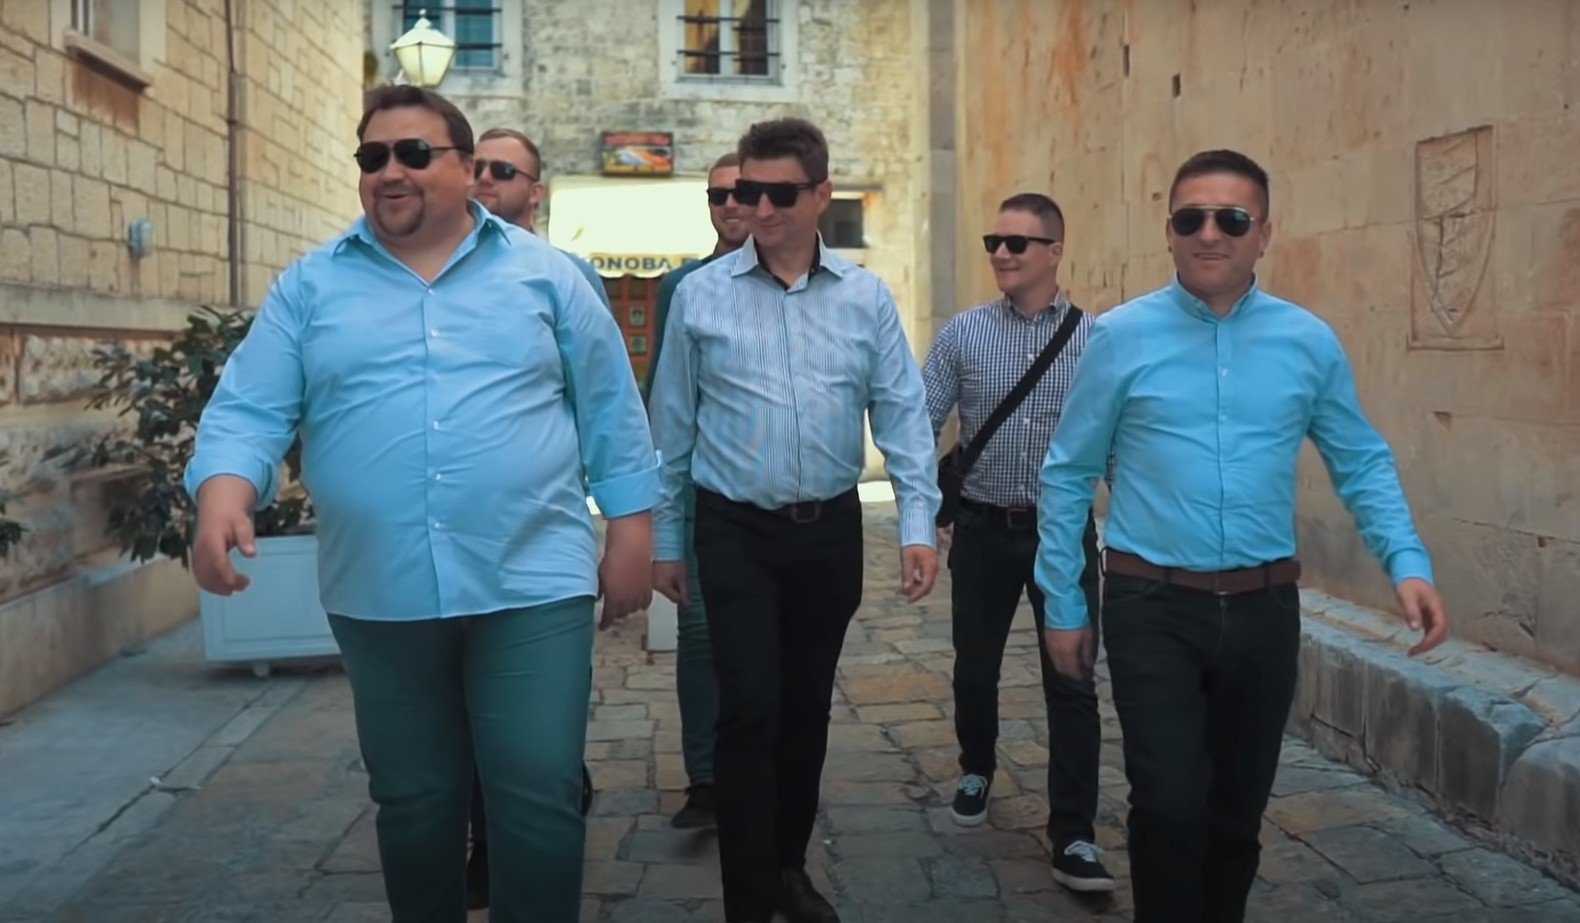 Tamburaški sastav Šokci ispravili nepravdu – snimili videospot za hit iz 2018. godine